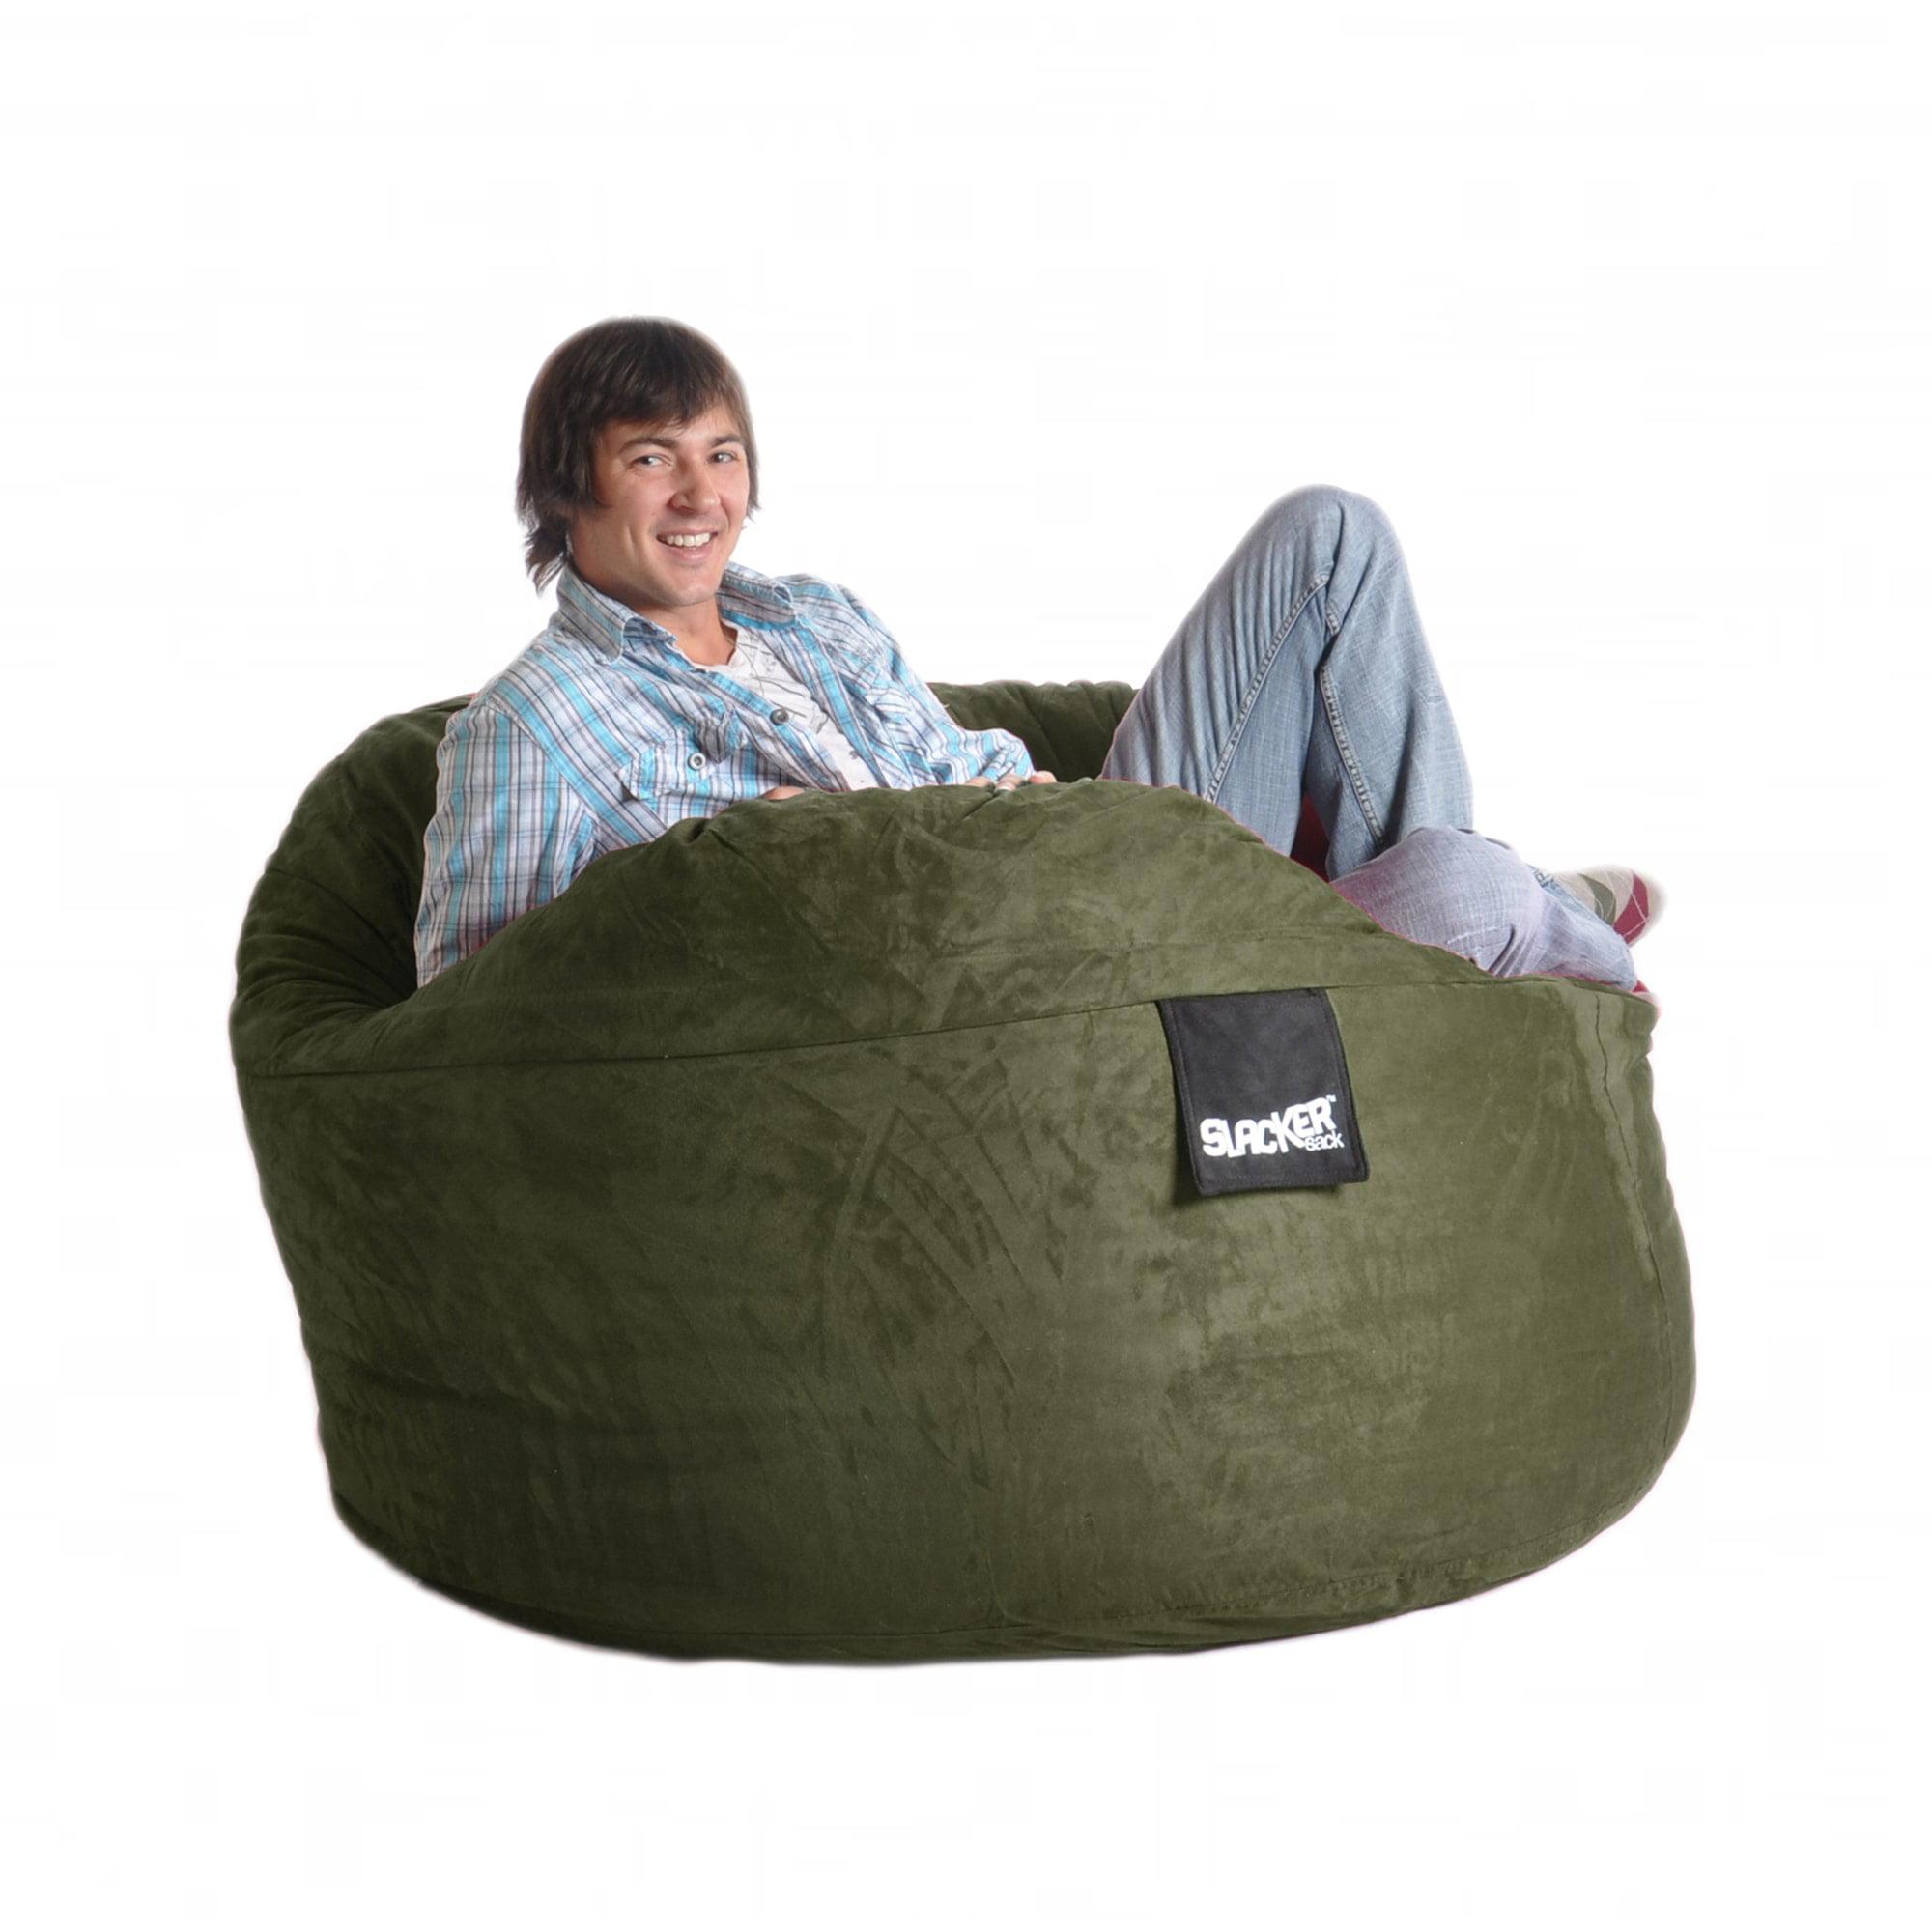 Slacker Sack Olive Green 5-foot Microfiber and Foam Bean Bag